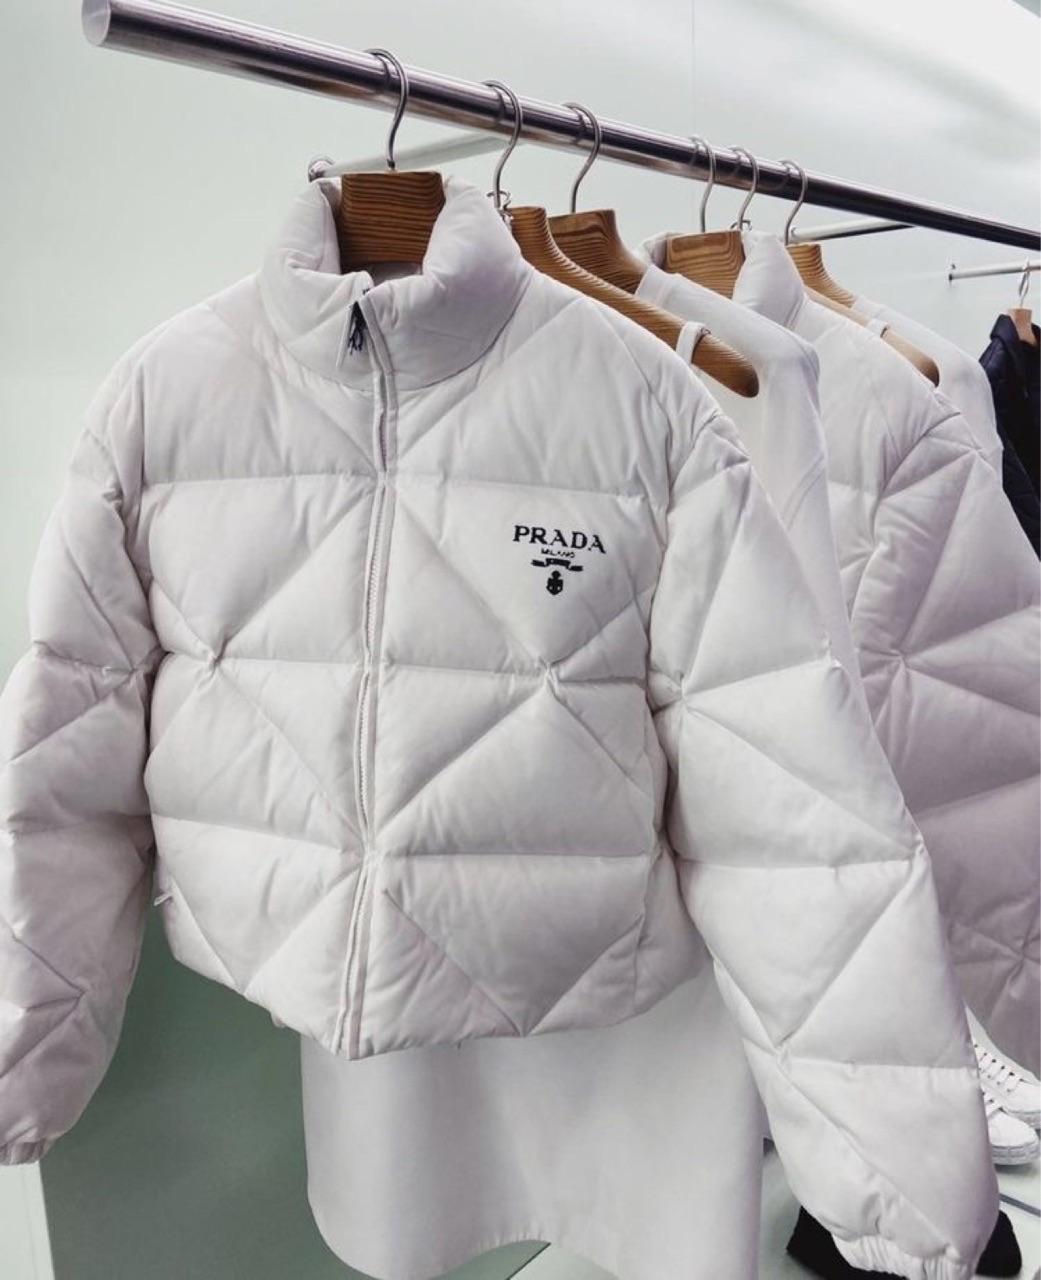 Prada, clothes, and fashion image